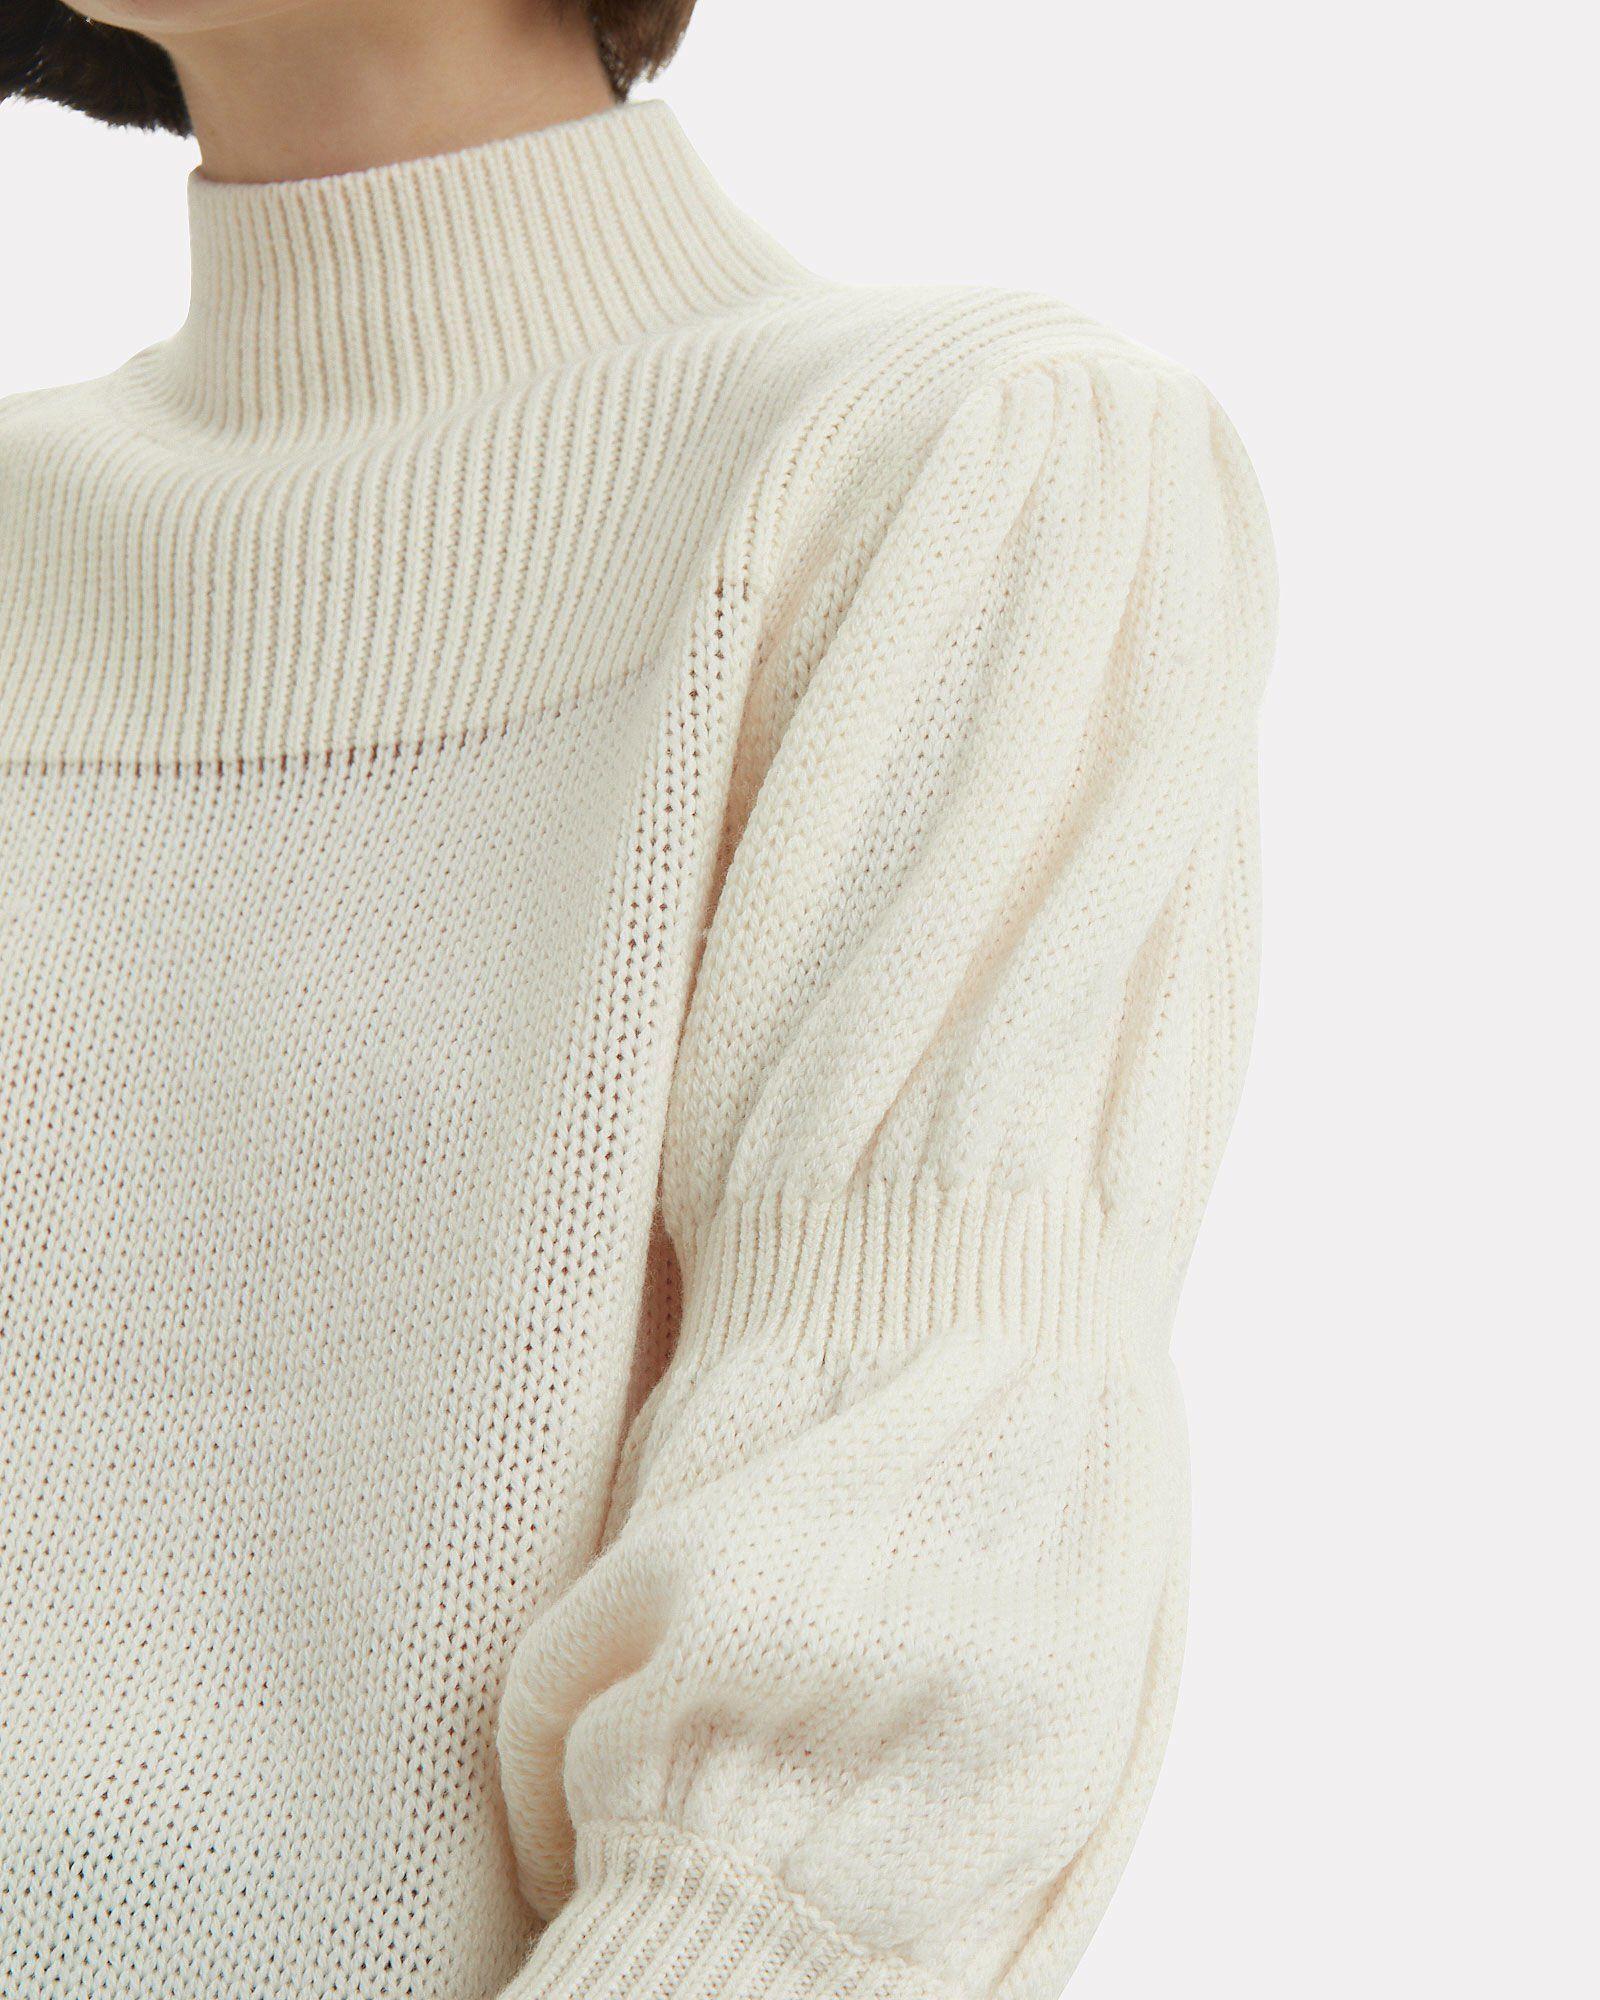 AGGEL KNITWEAR Womens Mohair Crop Pullover